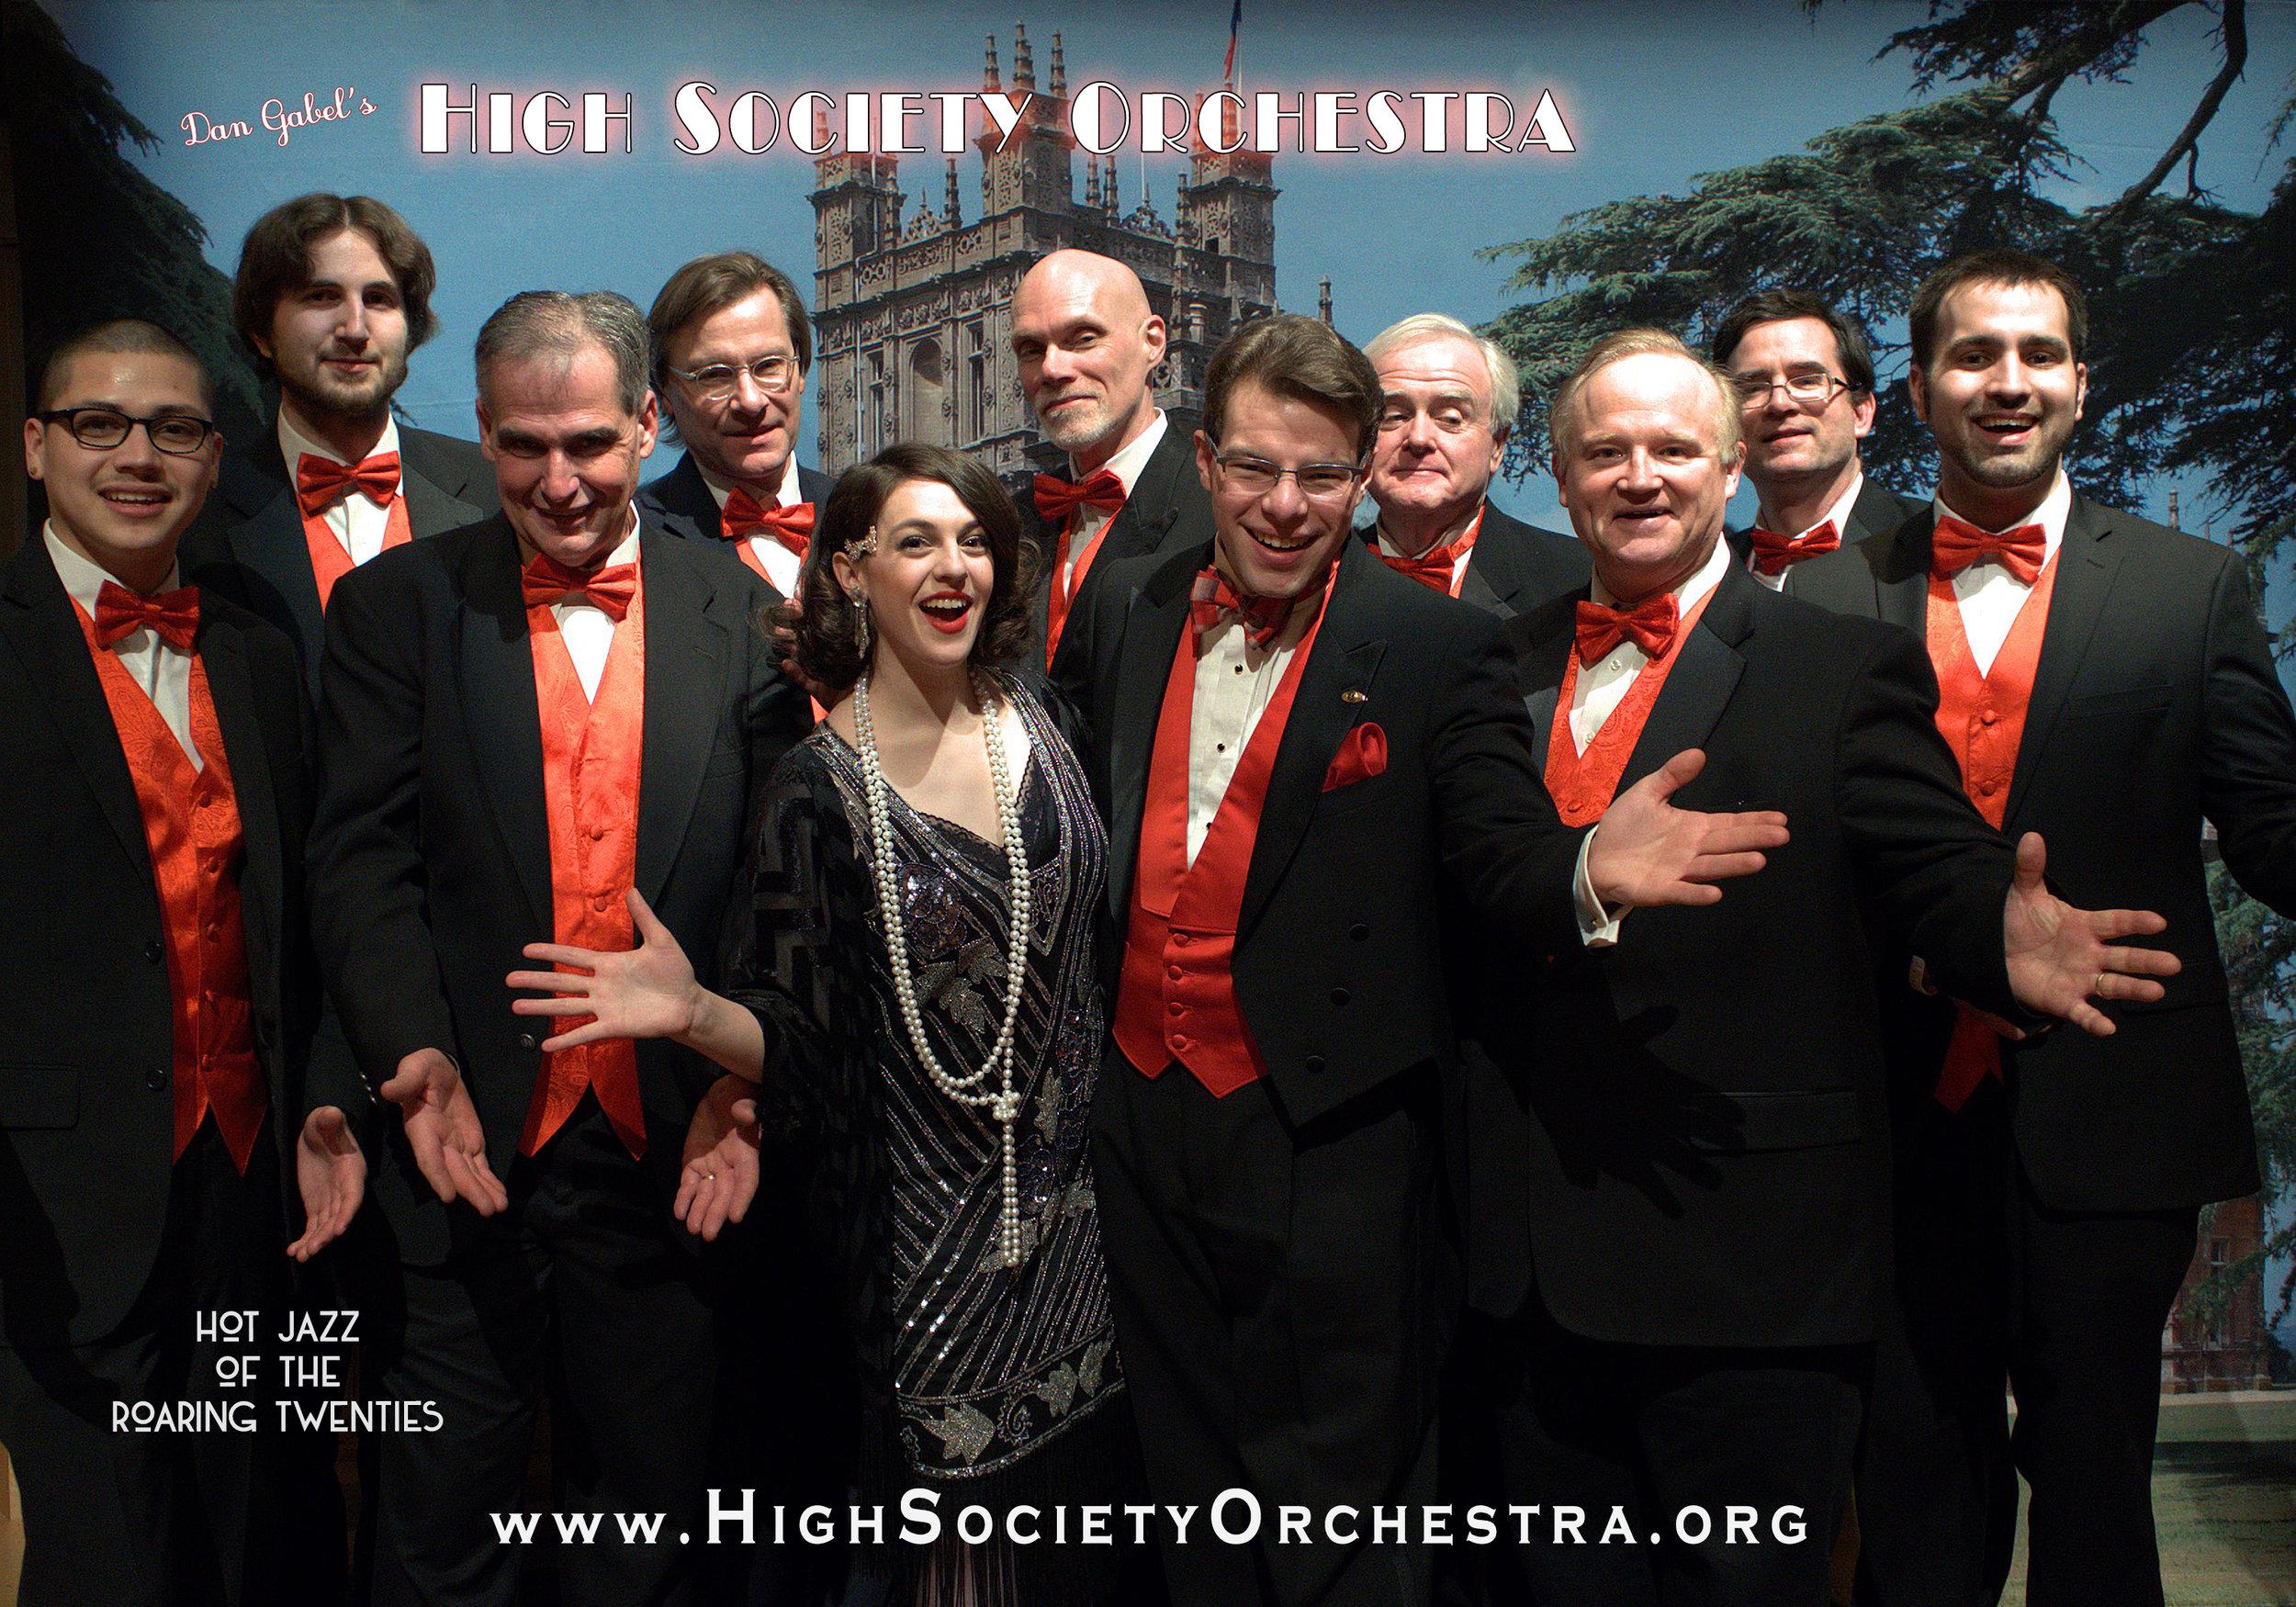 DG HSO Downton promo photo.jpg